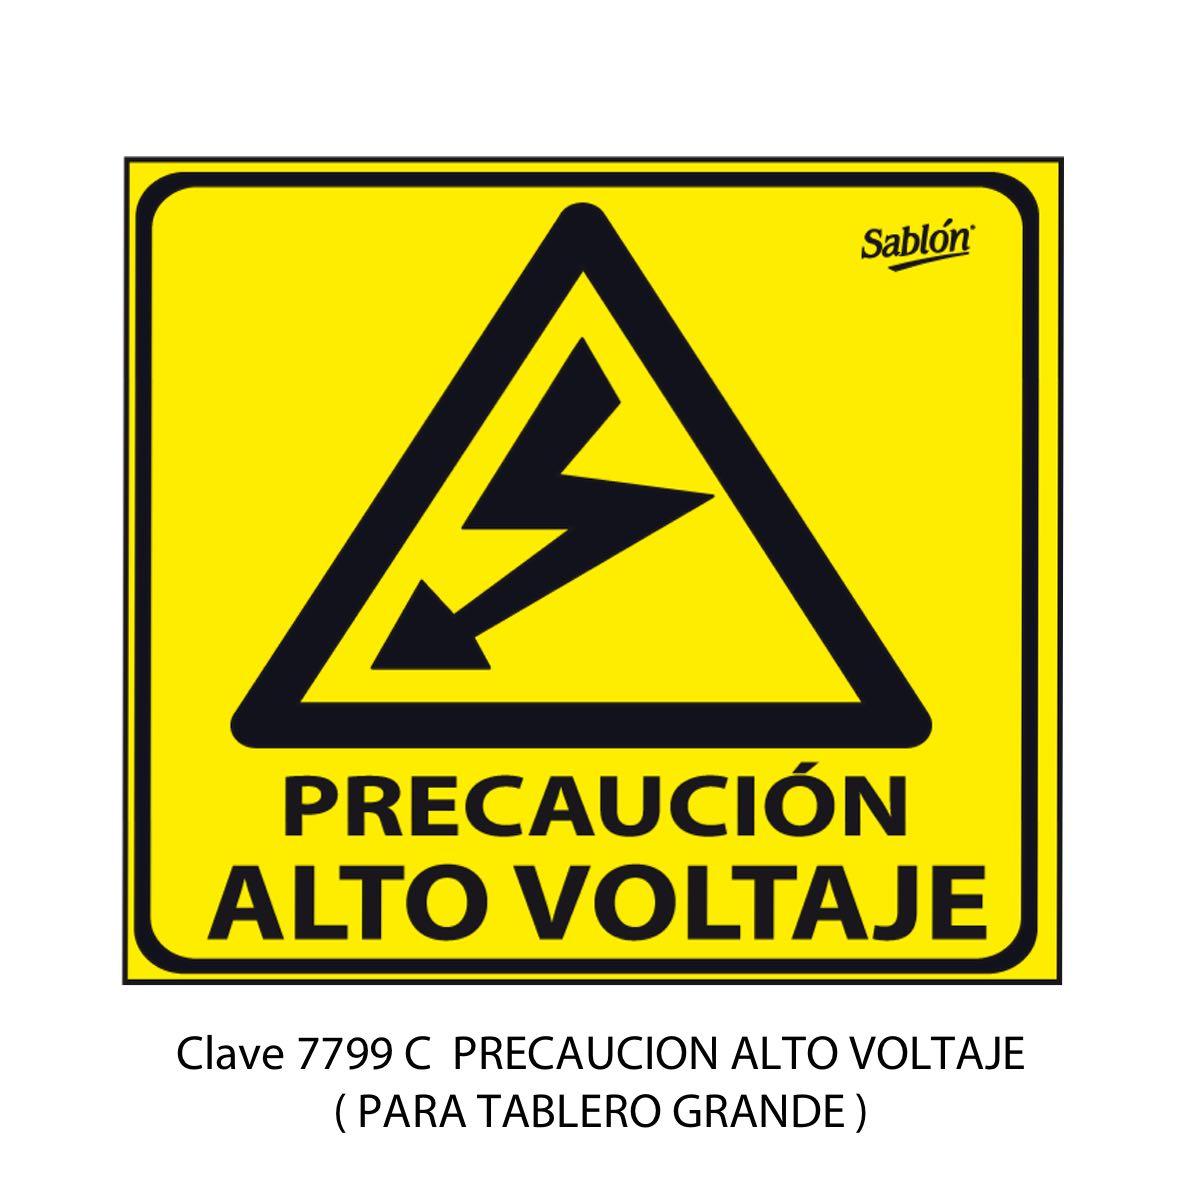 SeÑal de Alto Voltaje Grande Modelo 7799 C - Sablón